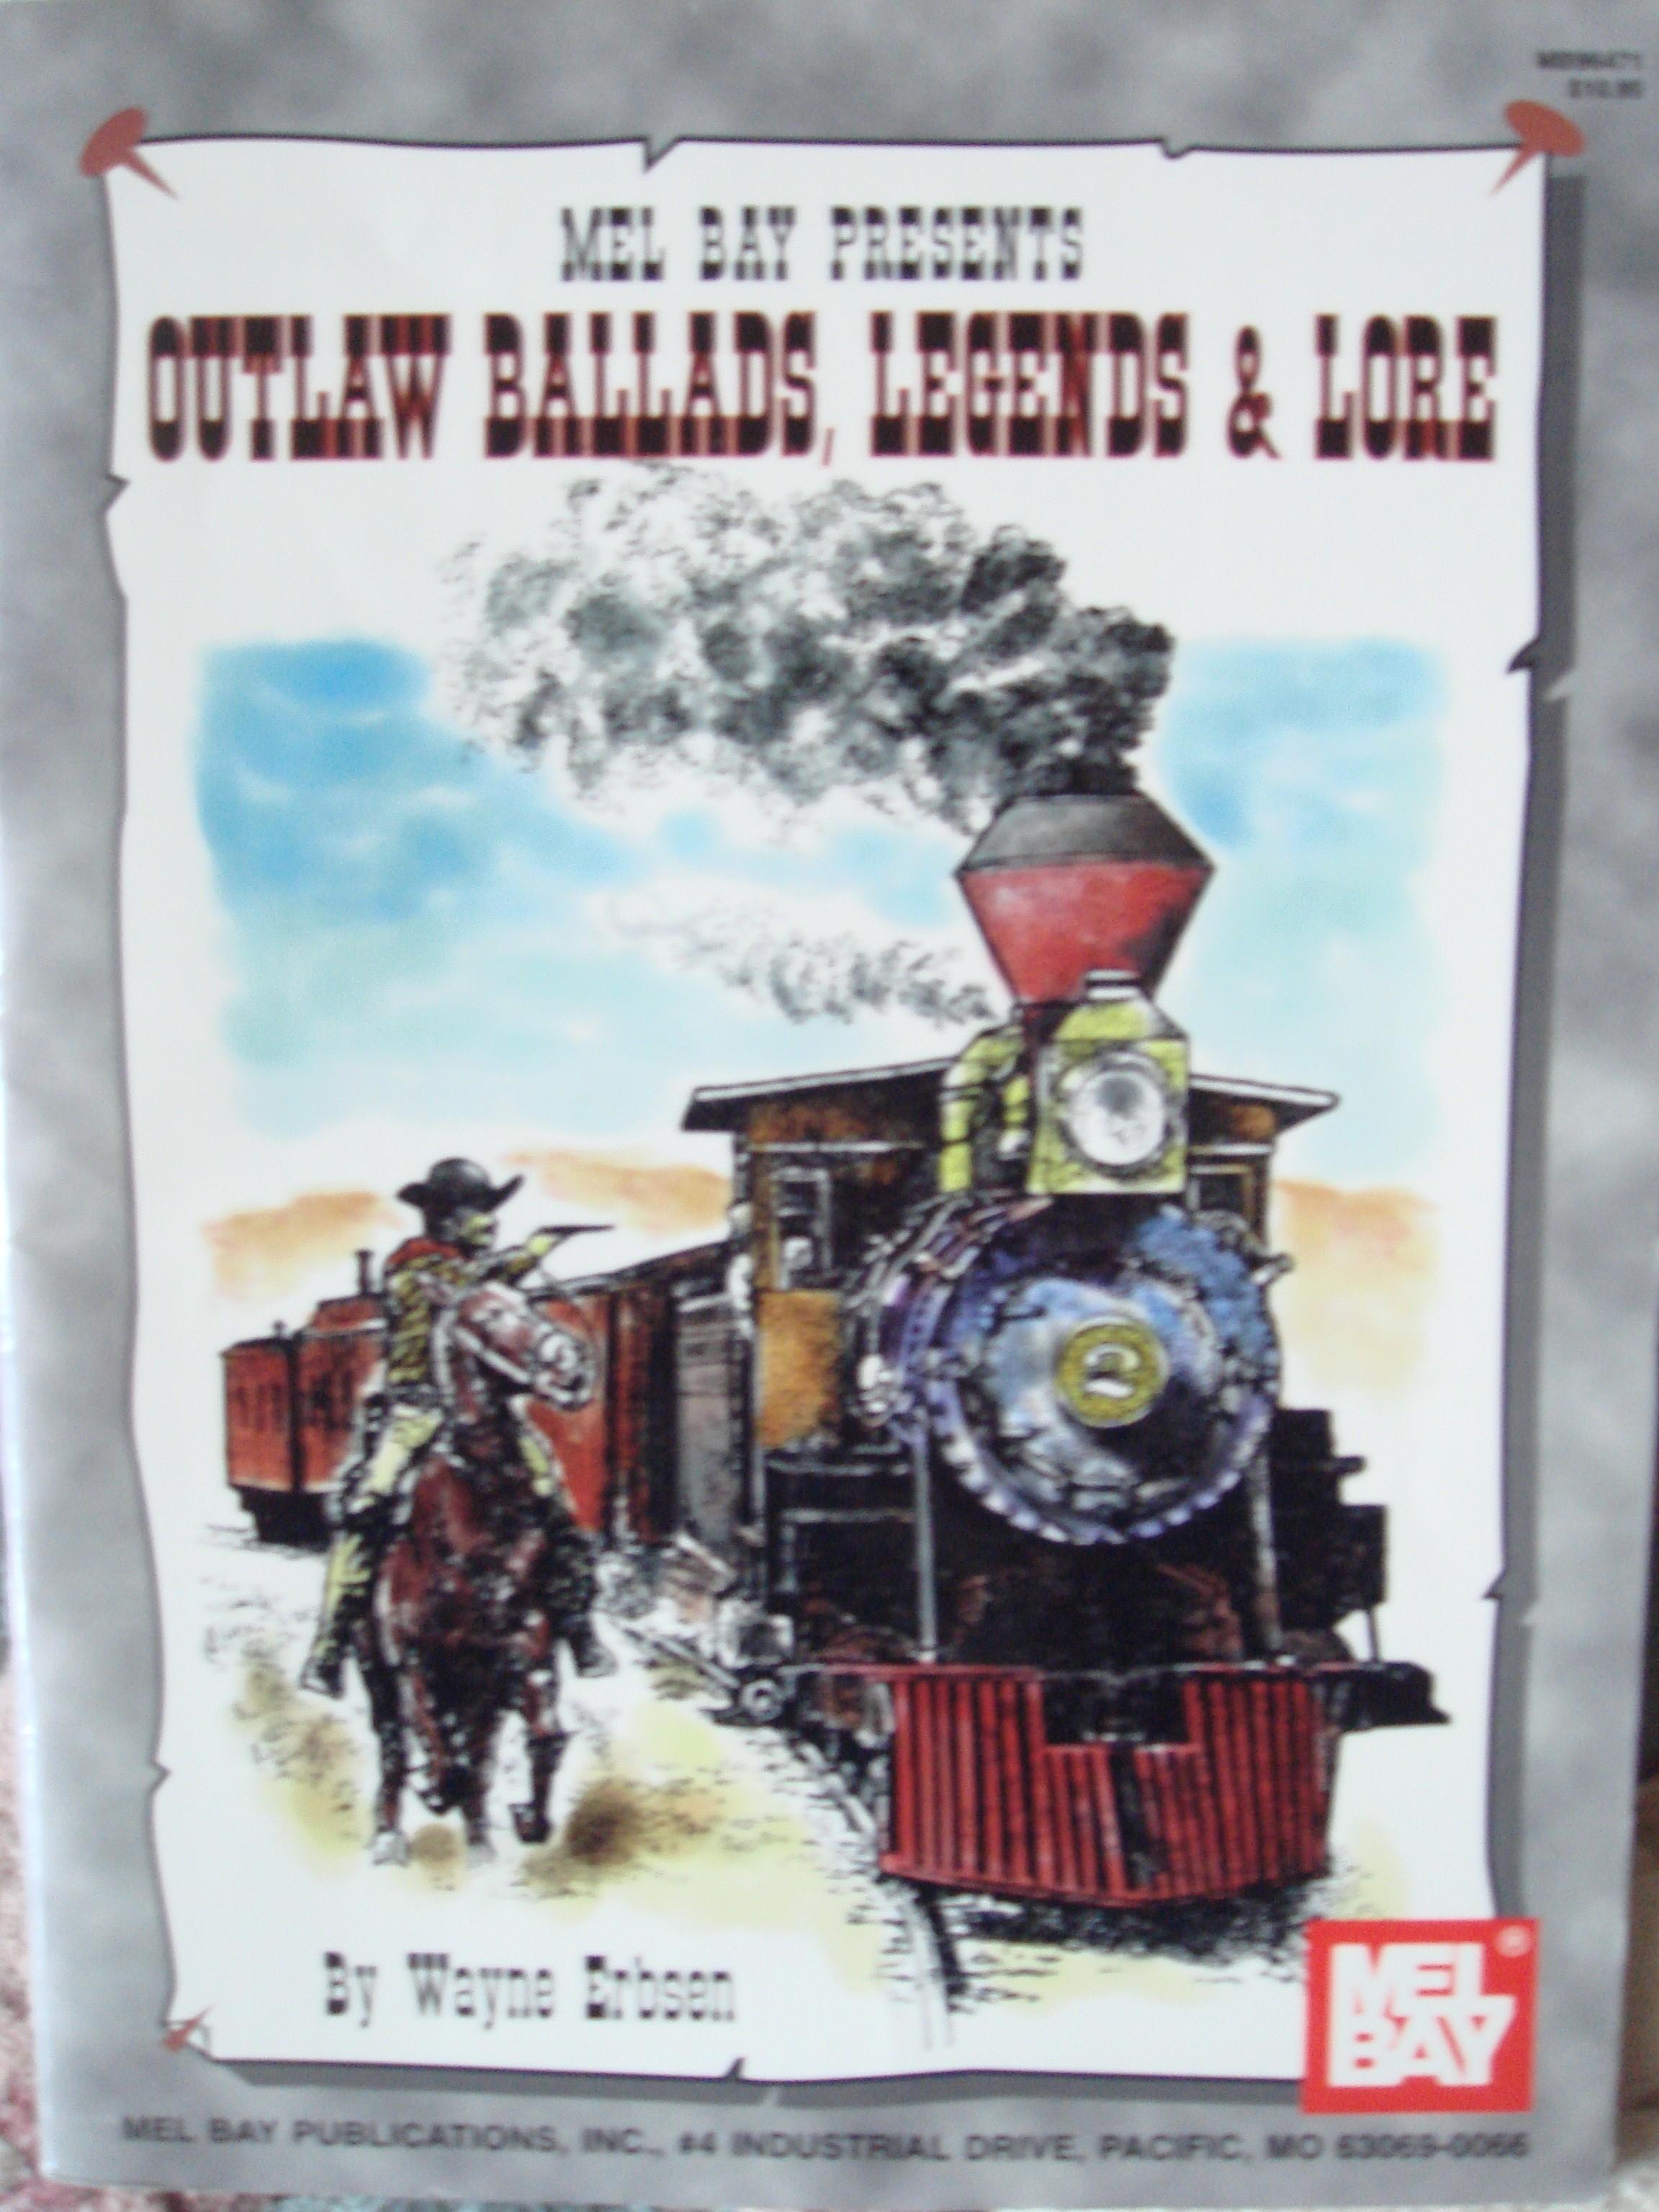 Mel Bay Outlaw Ballads Legends & Lore Songbook Wayne Erbsen S134